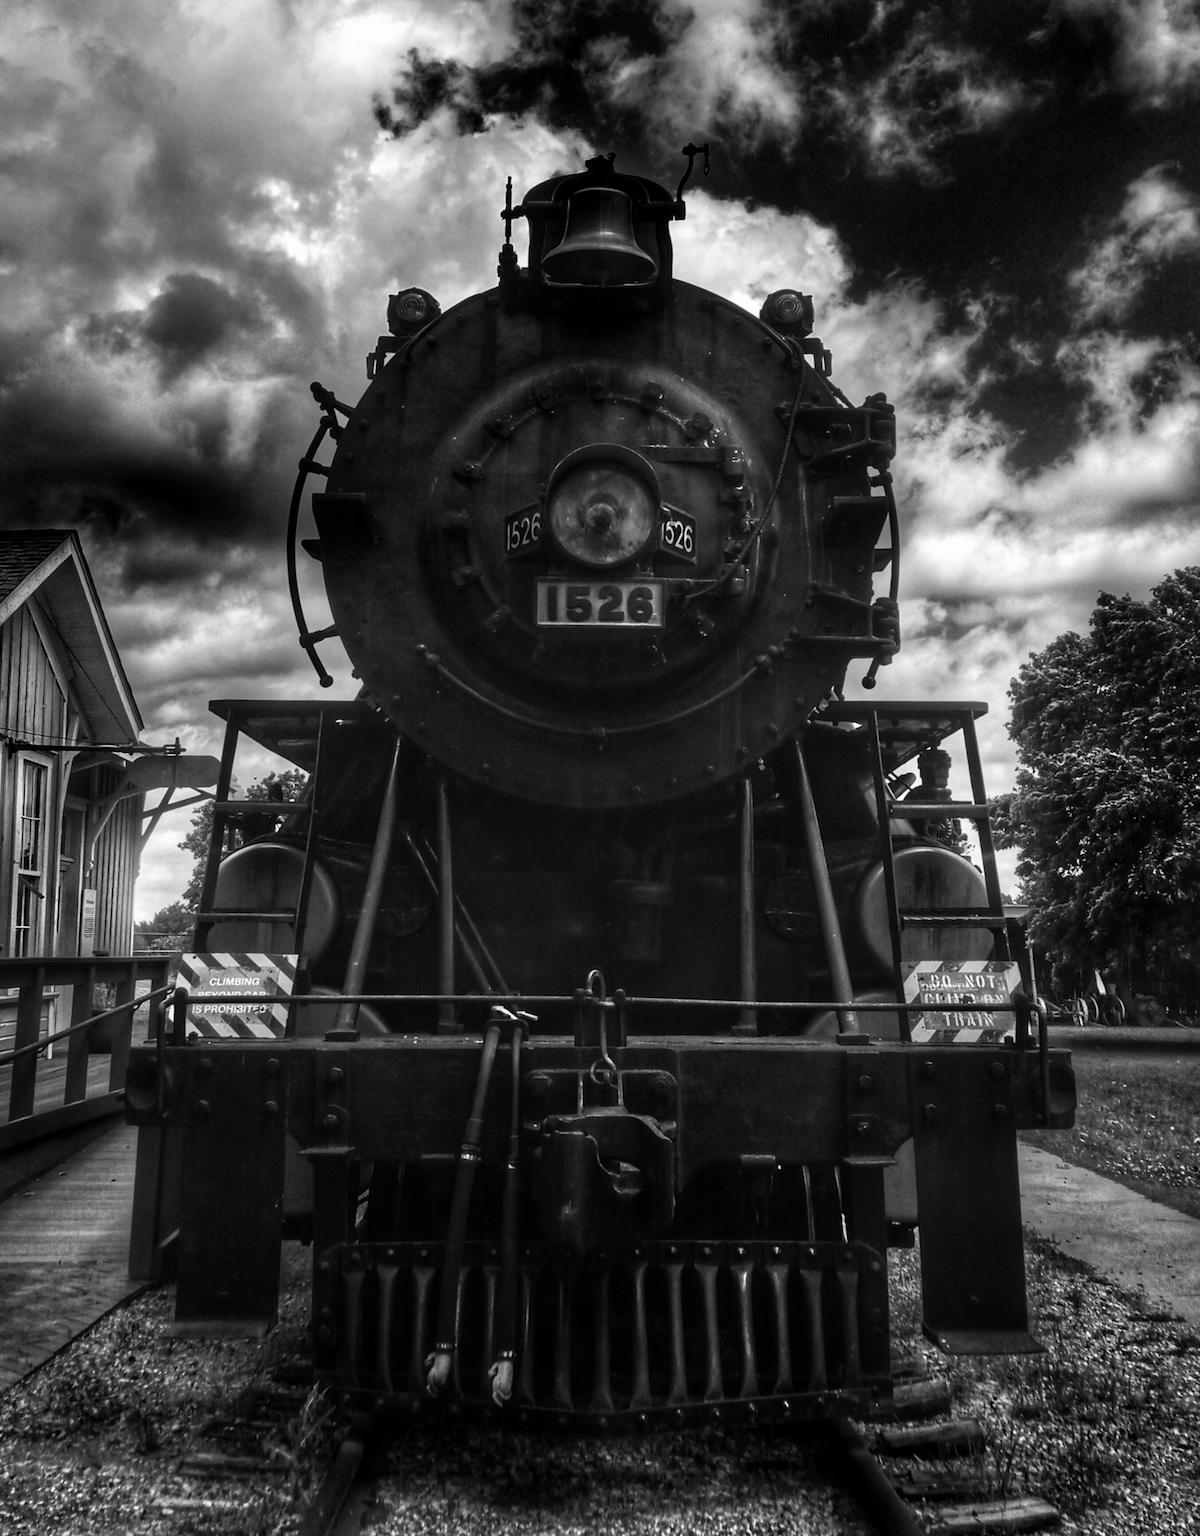 Title: Locomotive Medium: Digital Photography Size: 1562x2000 pixels 1.5MB